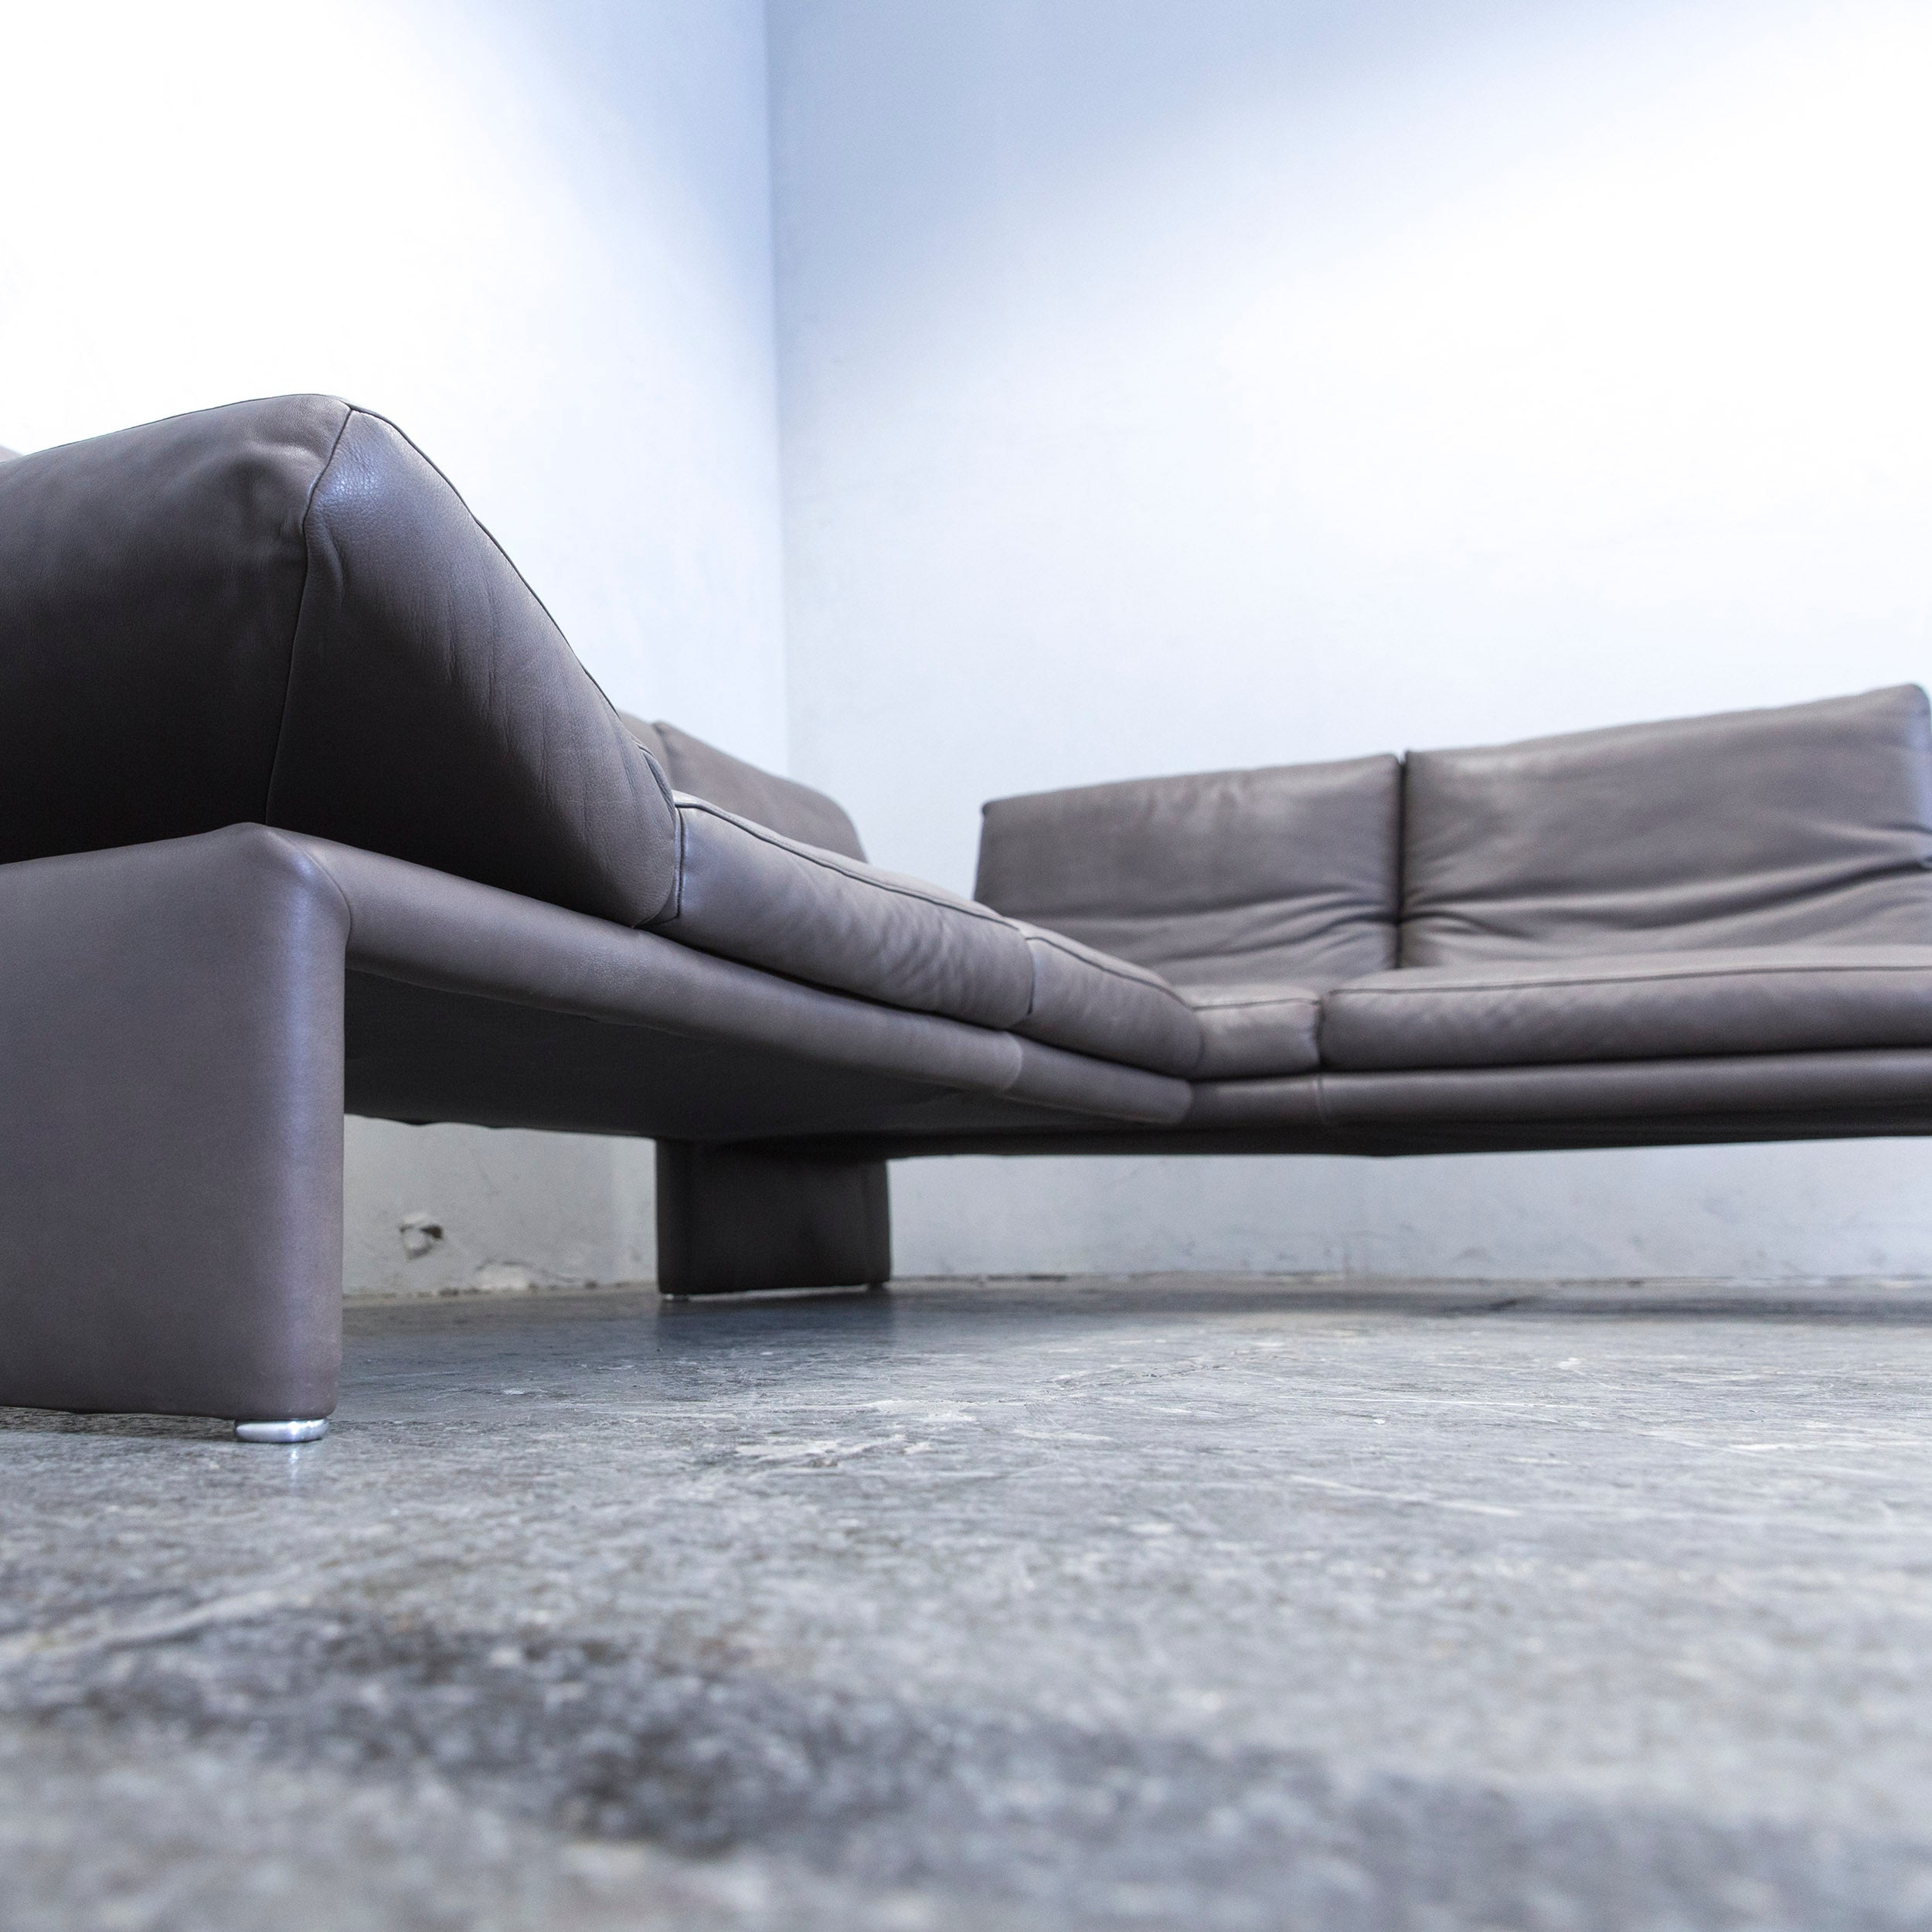 leder kautsch best amazing perfect echtes leder sofa sectional sofa im wohnzimmer ecke wohnmbel. Black Bedroom Furniture Sets. Home Design Ideas